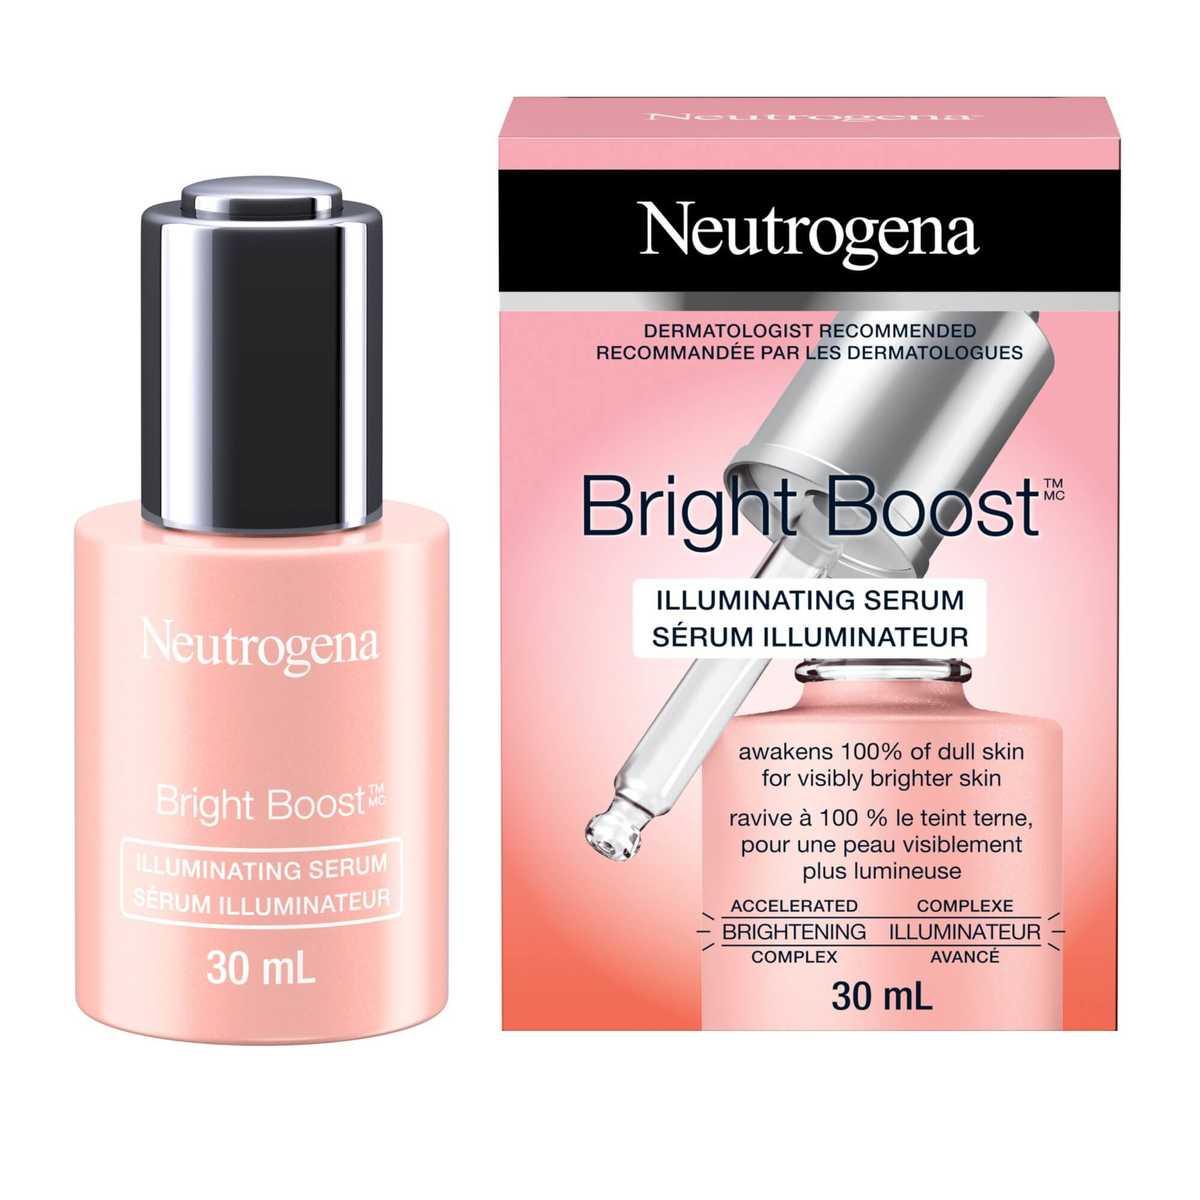 Sérum illuminateur Neutrogena Bright Boost